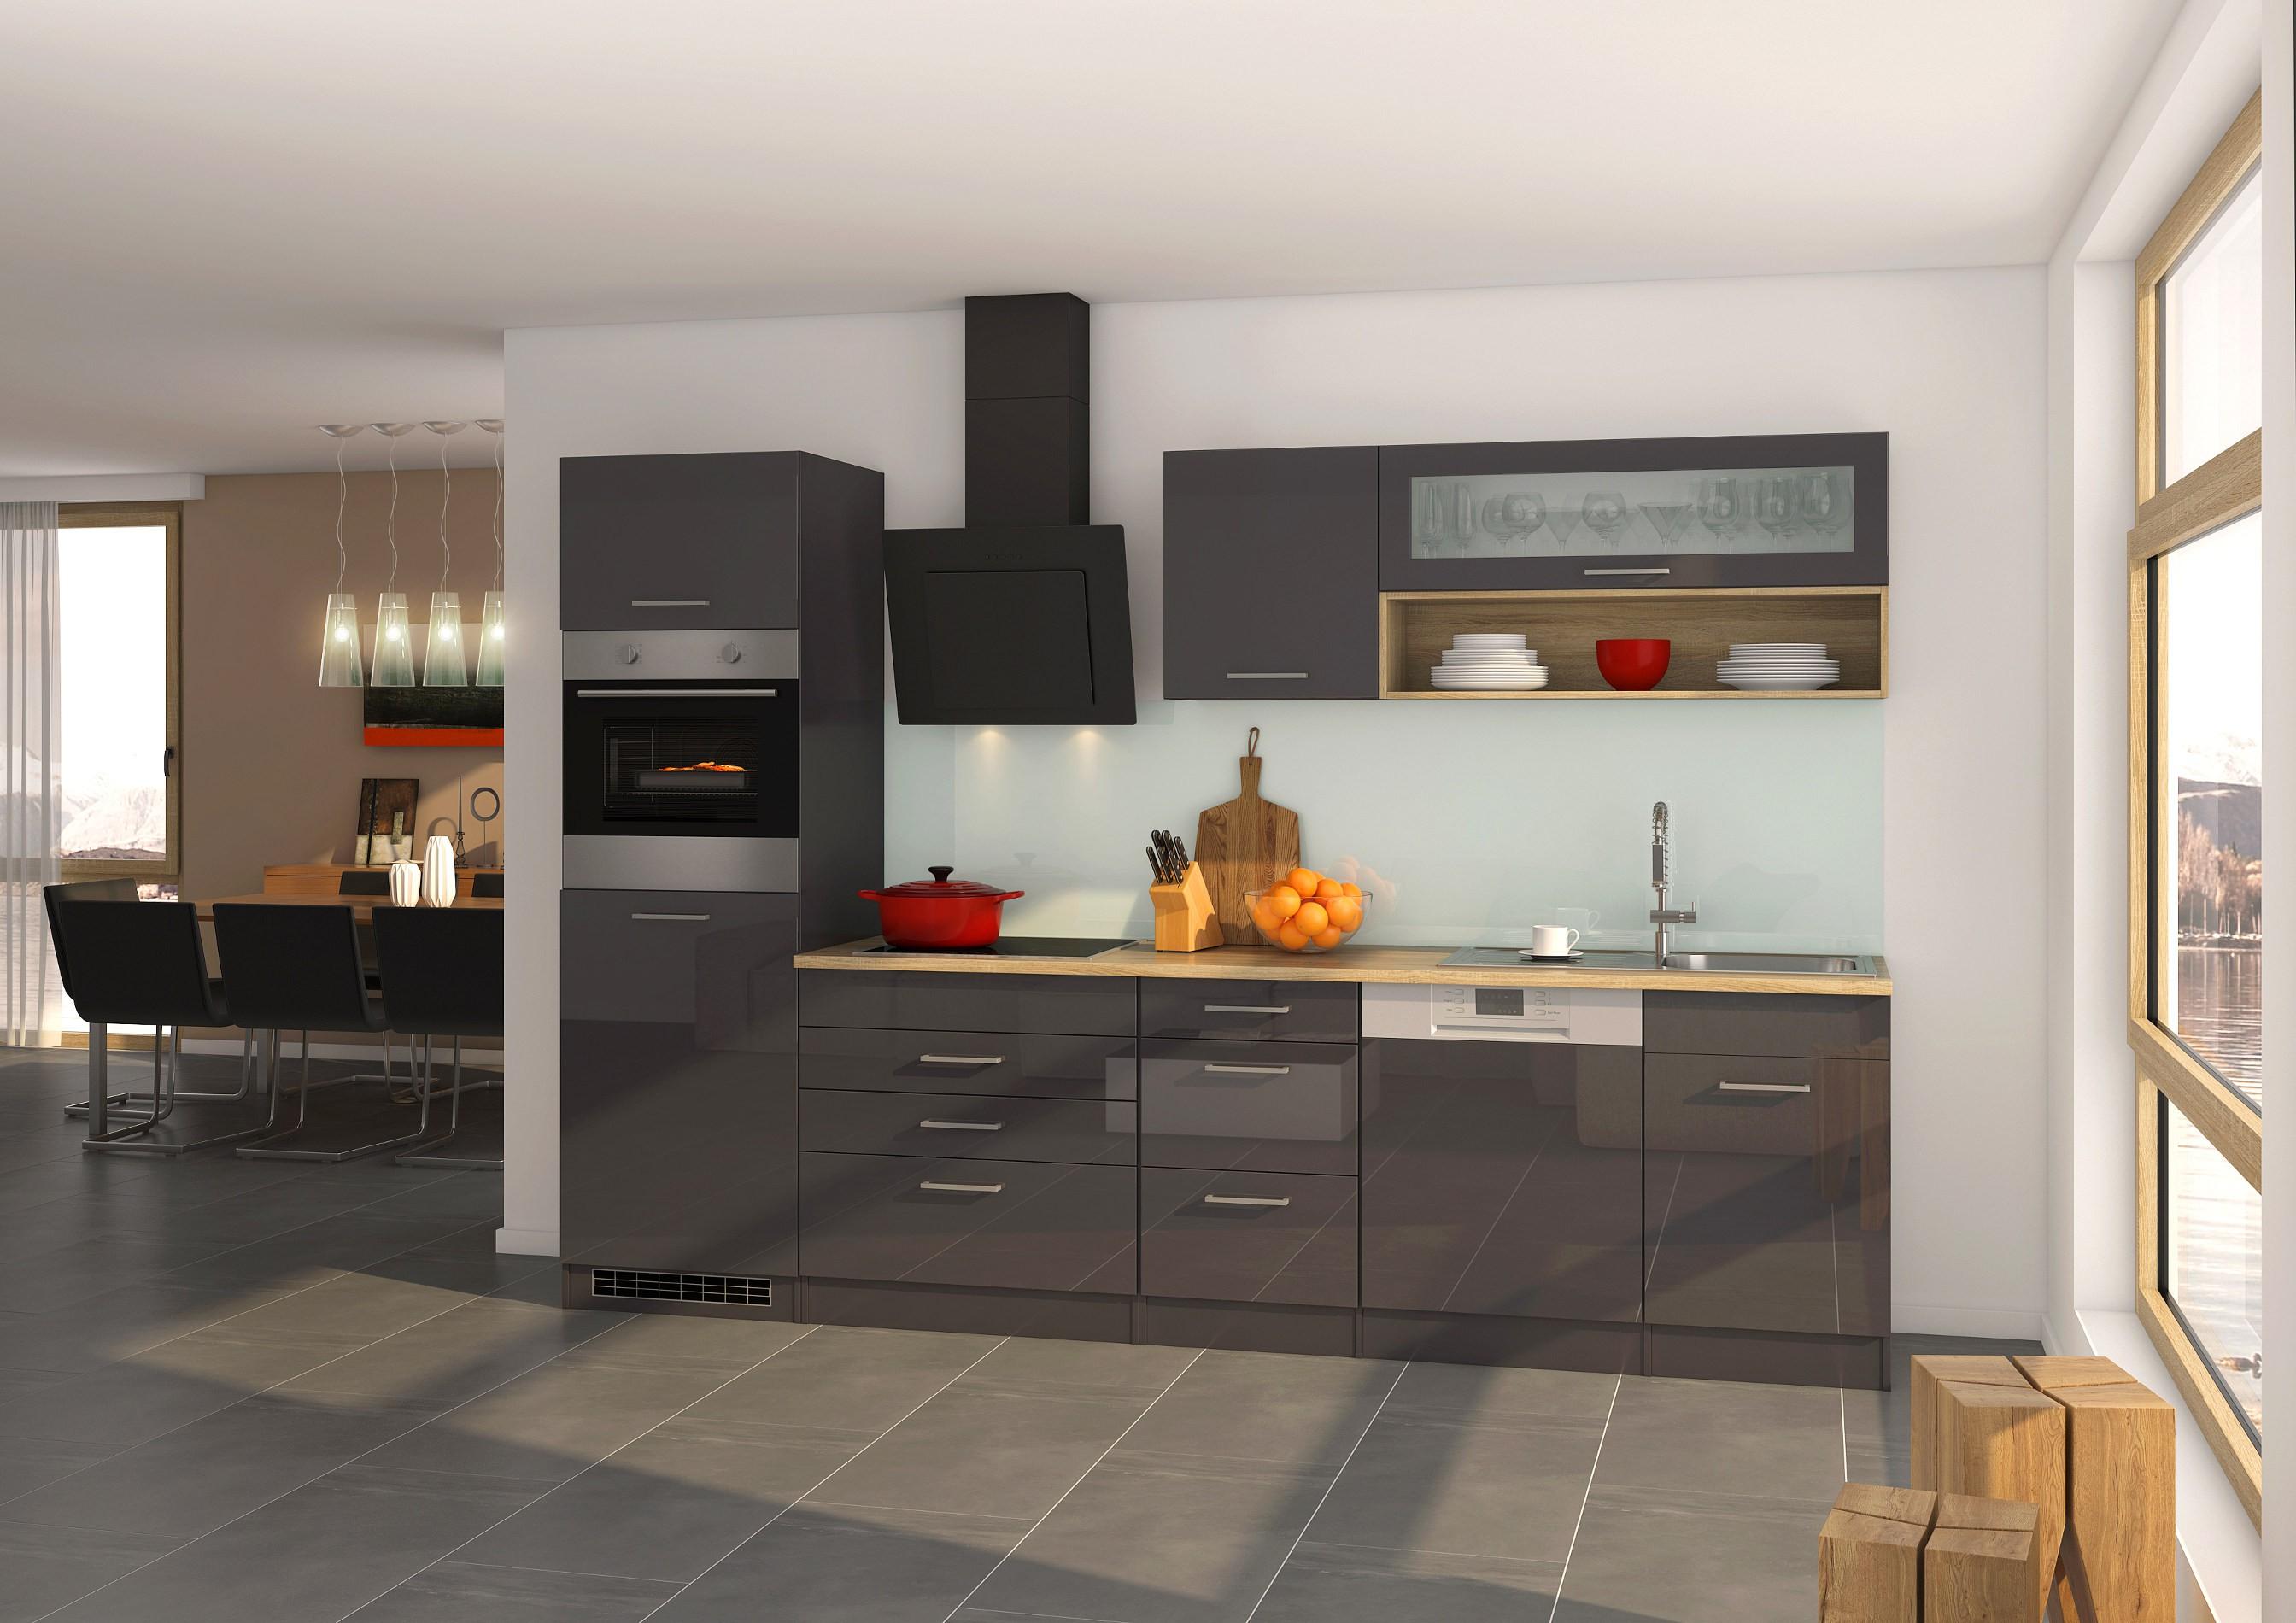 k chen h ngeschrank m nchen 1 glasklappe 110 cm breit. Black Bedroom Furniture Sets. Home Design Ideas